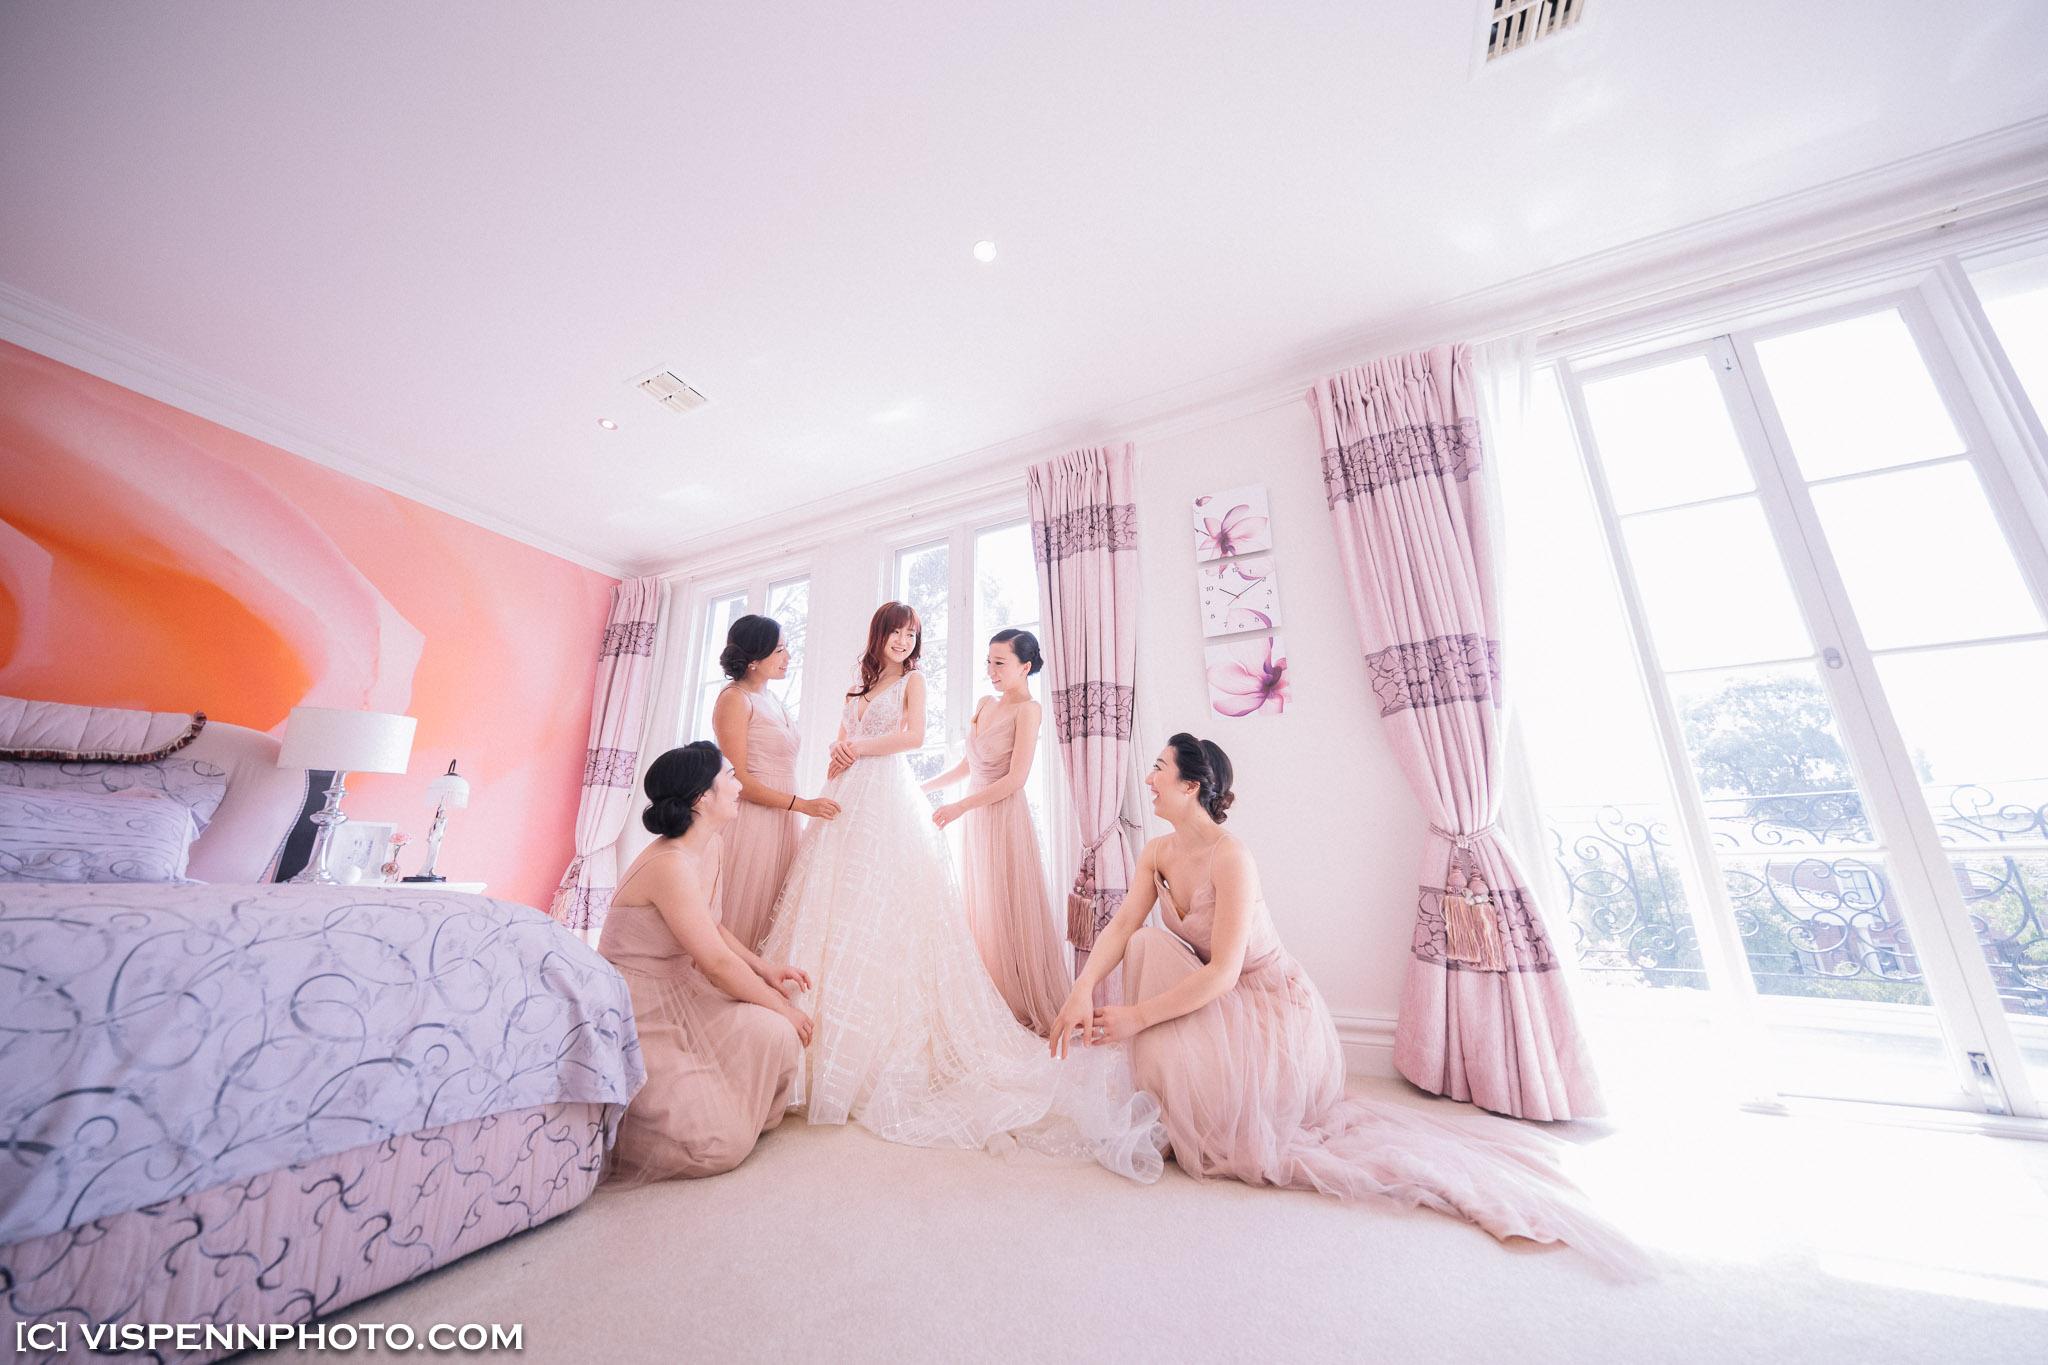 WEDDING DAY Photography Melbourne VISPENN 墨尔本 婚礼跟拍 婚礼摄像 婚礼摄影 结婚照 登记照 VISPENN 0042 5D4 1390